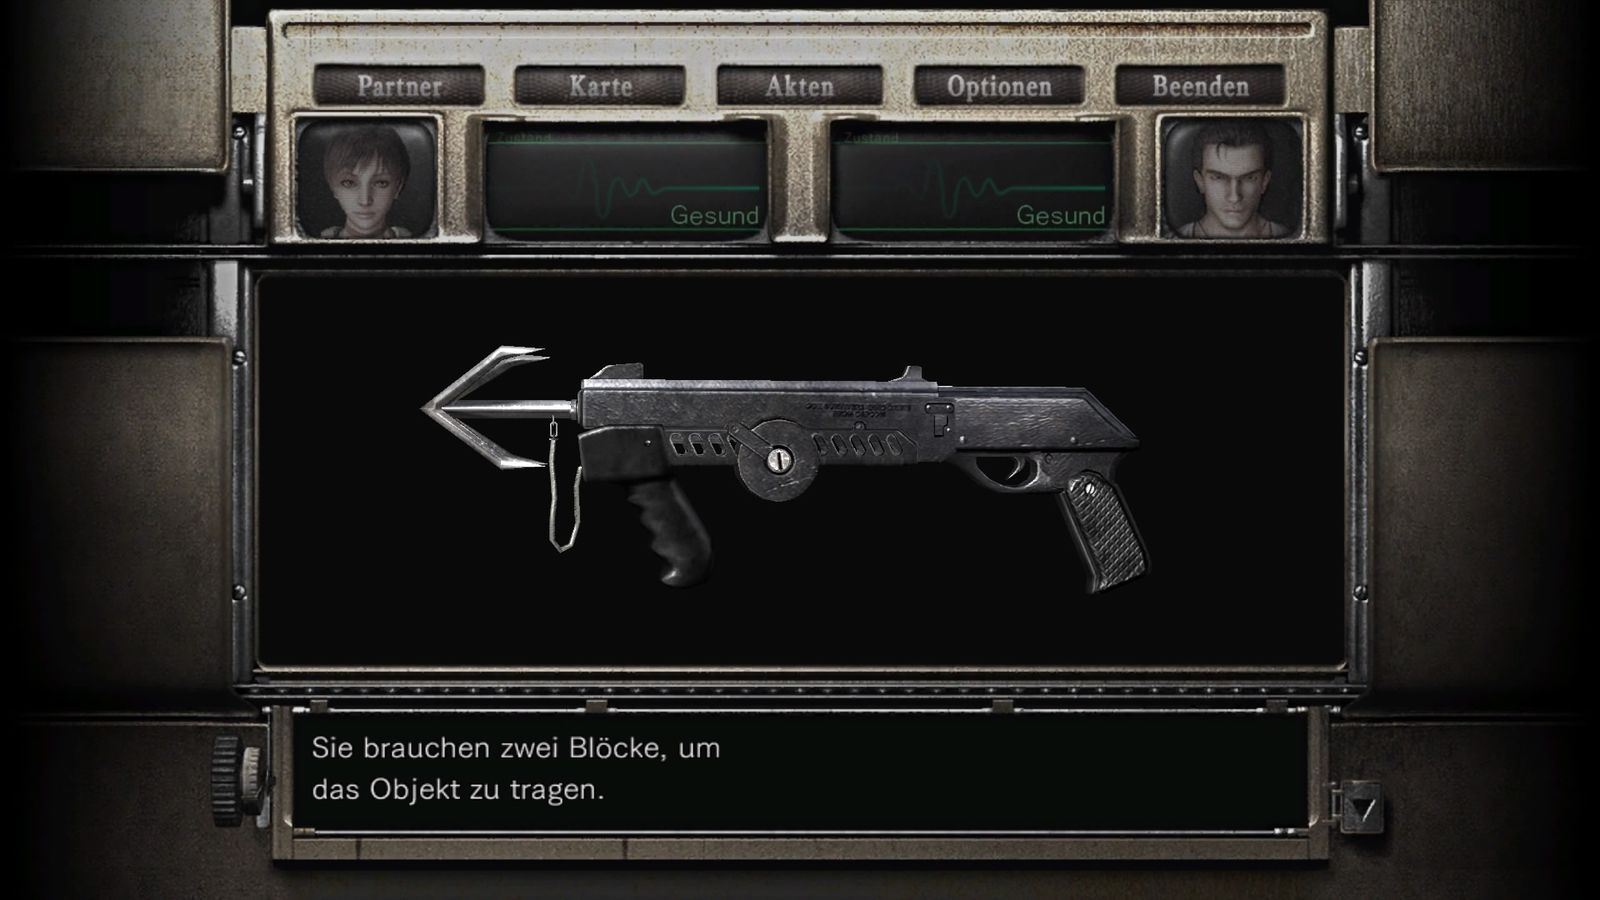 Abgespielt/ Resident Evil 0/ 7